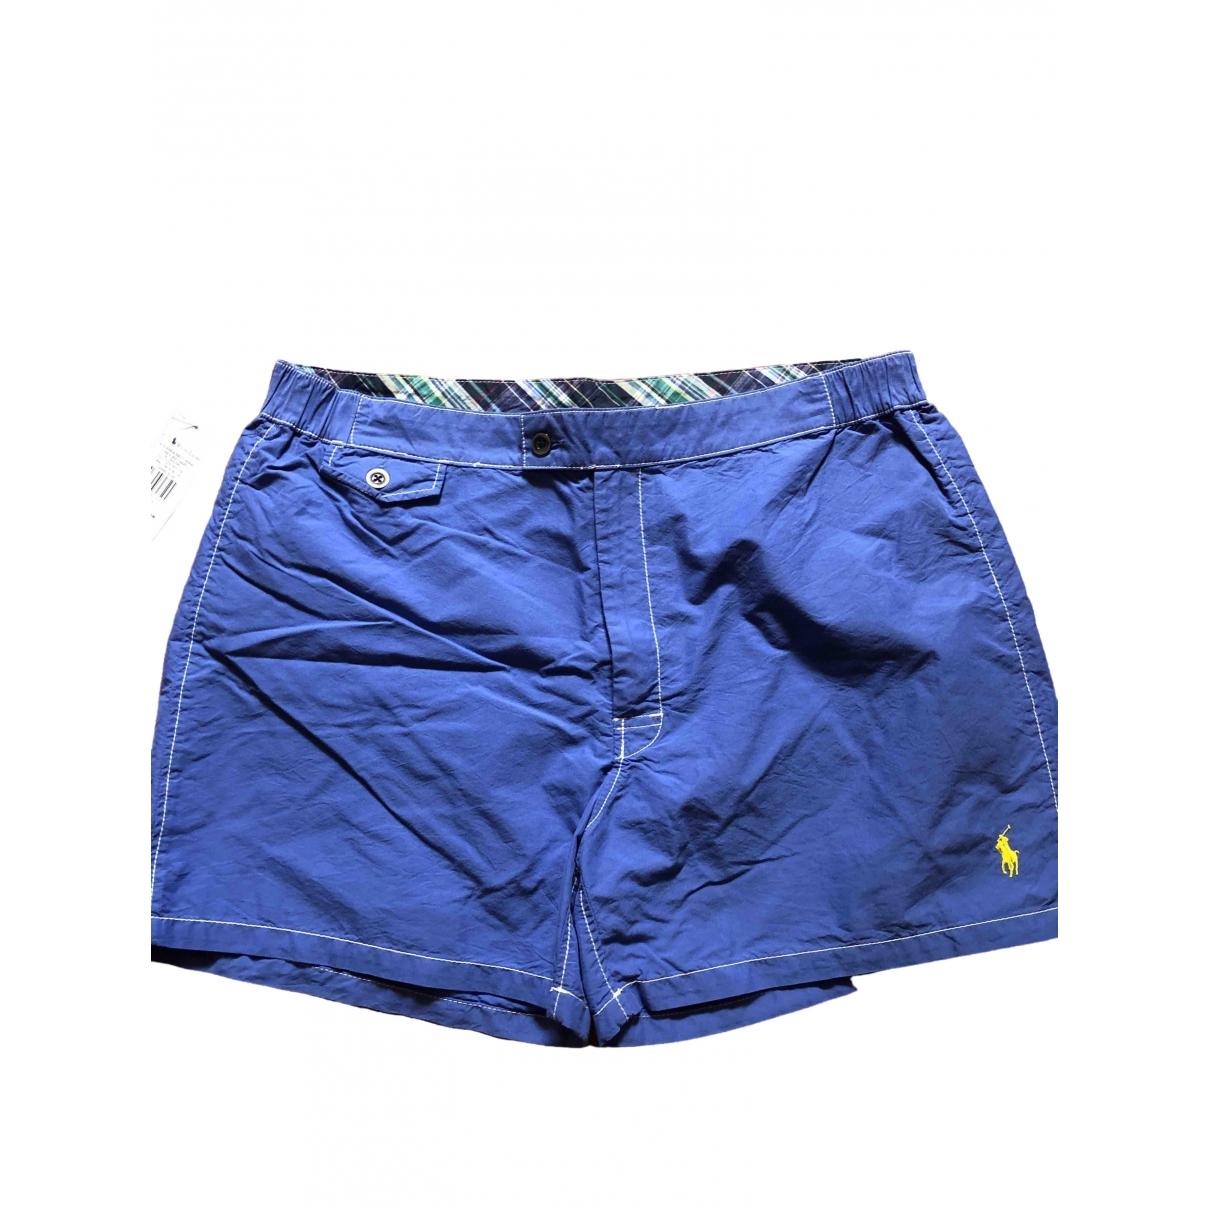 Polo Ralph Lauren \N Badeanzug in  Blau Baumwolle - Elasthan